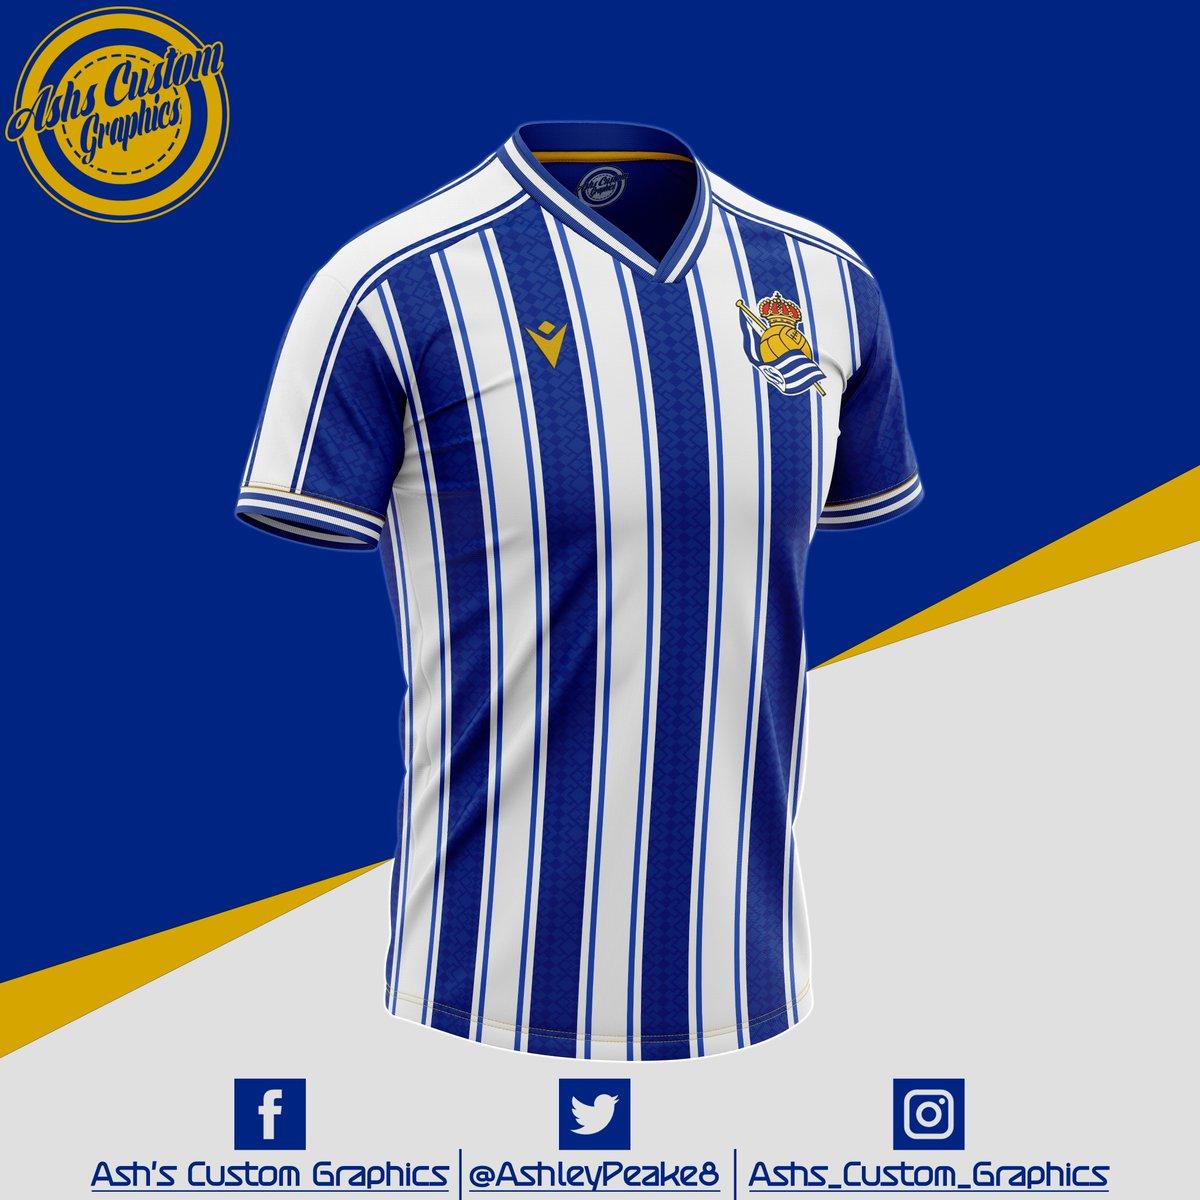 @RealSociedad x @RealSociedadFEM x @RealSociedadEN  @RealSociedadFR  @MacronSports @iqoniq   @21LVA @adnanjanuzaj @_nachomonreal @illarra4 @mikel10oyar   #RealSociedad #laliga #spain #macron #kitconcept #conceptkit #kitdesign #football #futbol #soccer #AurreraReala #footballshirt